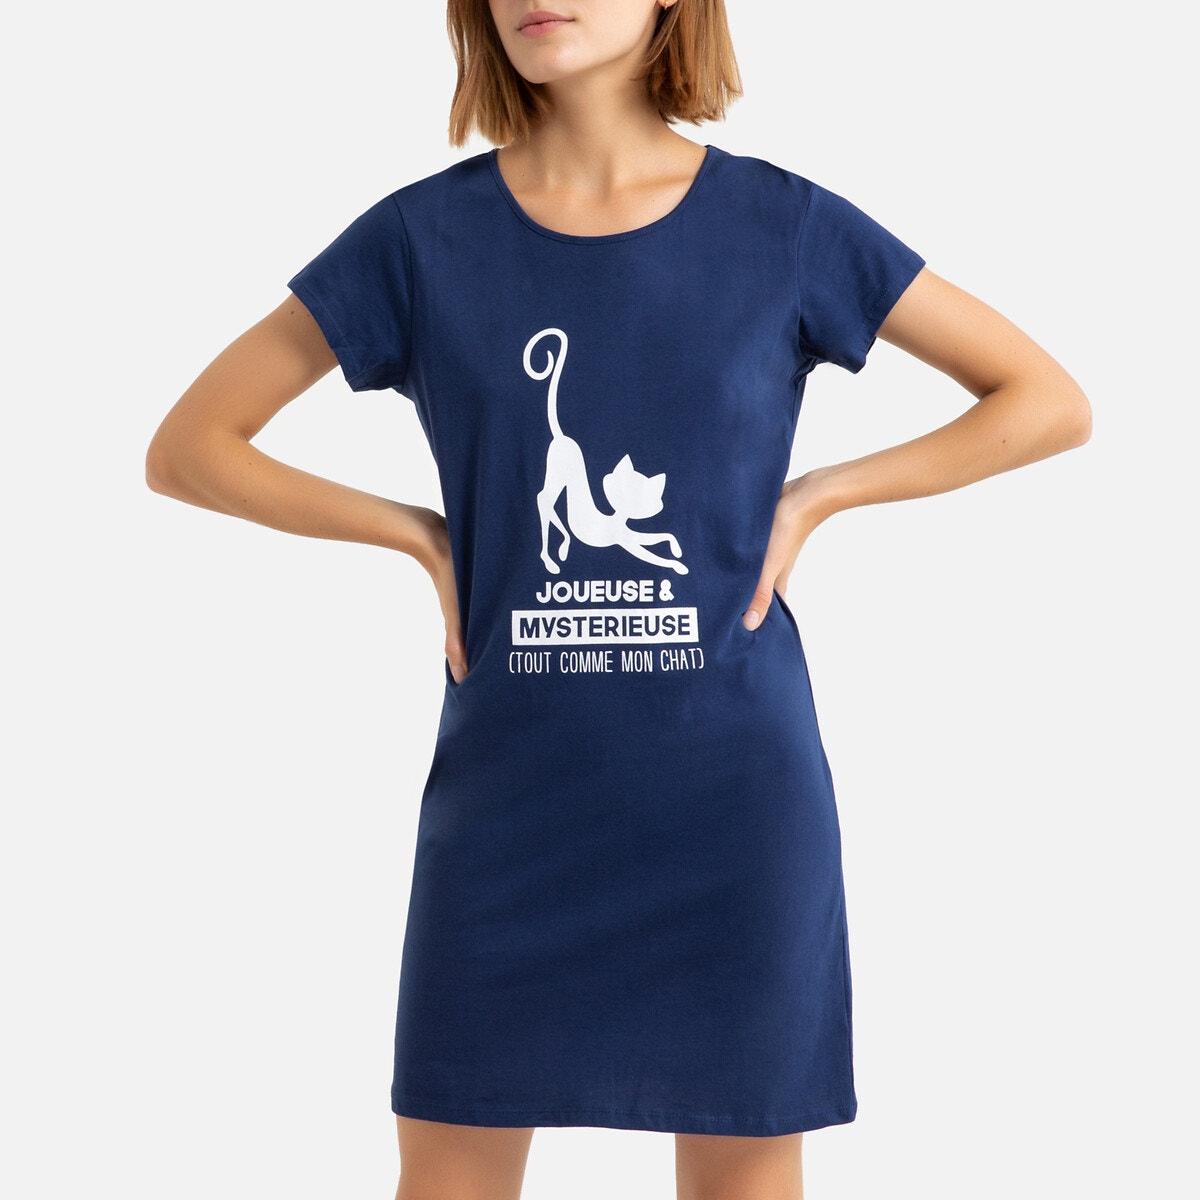 Catsline - Νυχτικό σε γραμμή T-shirt 350174083 - 5821